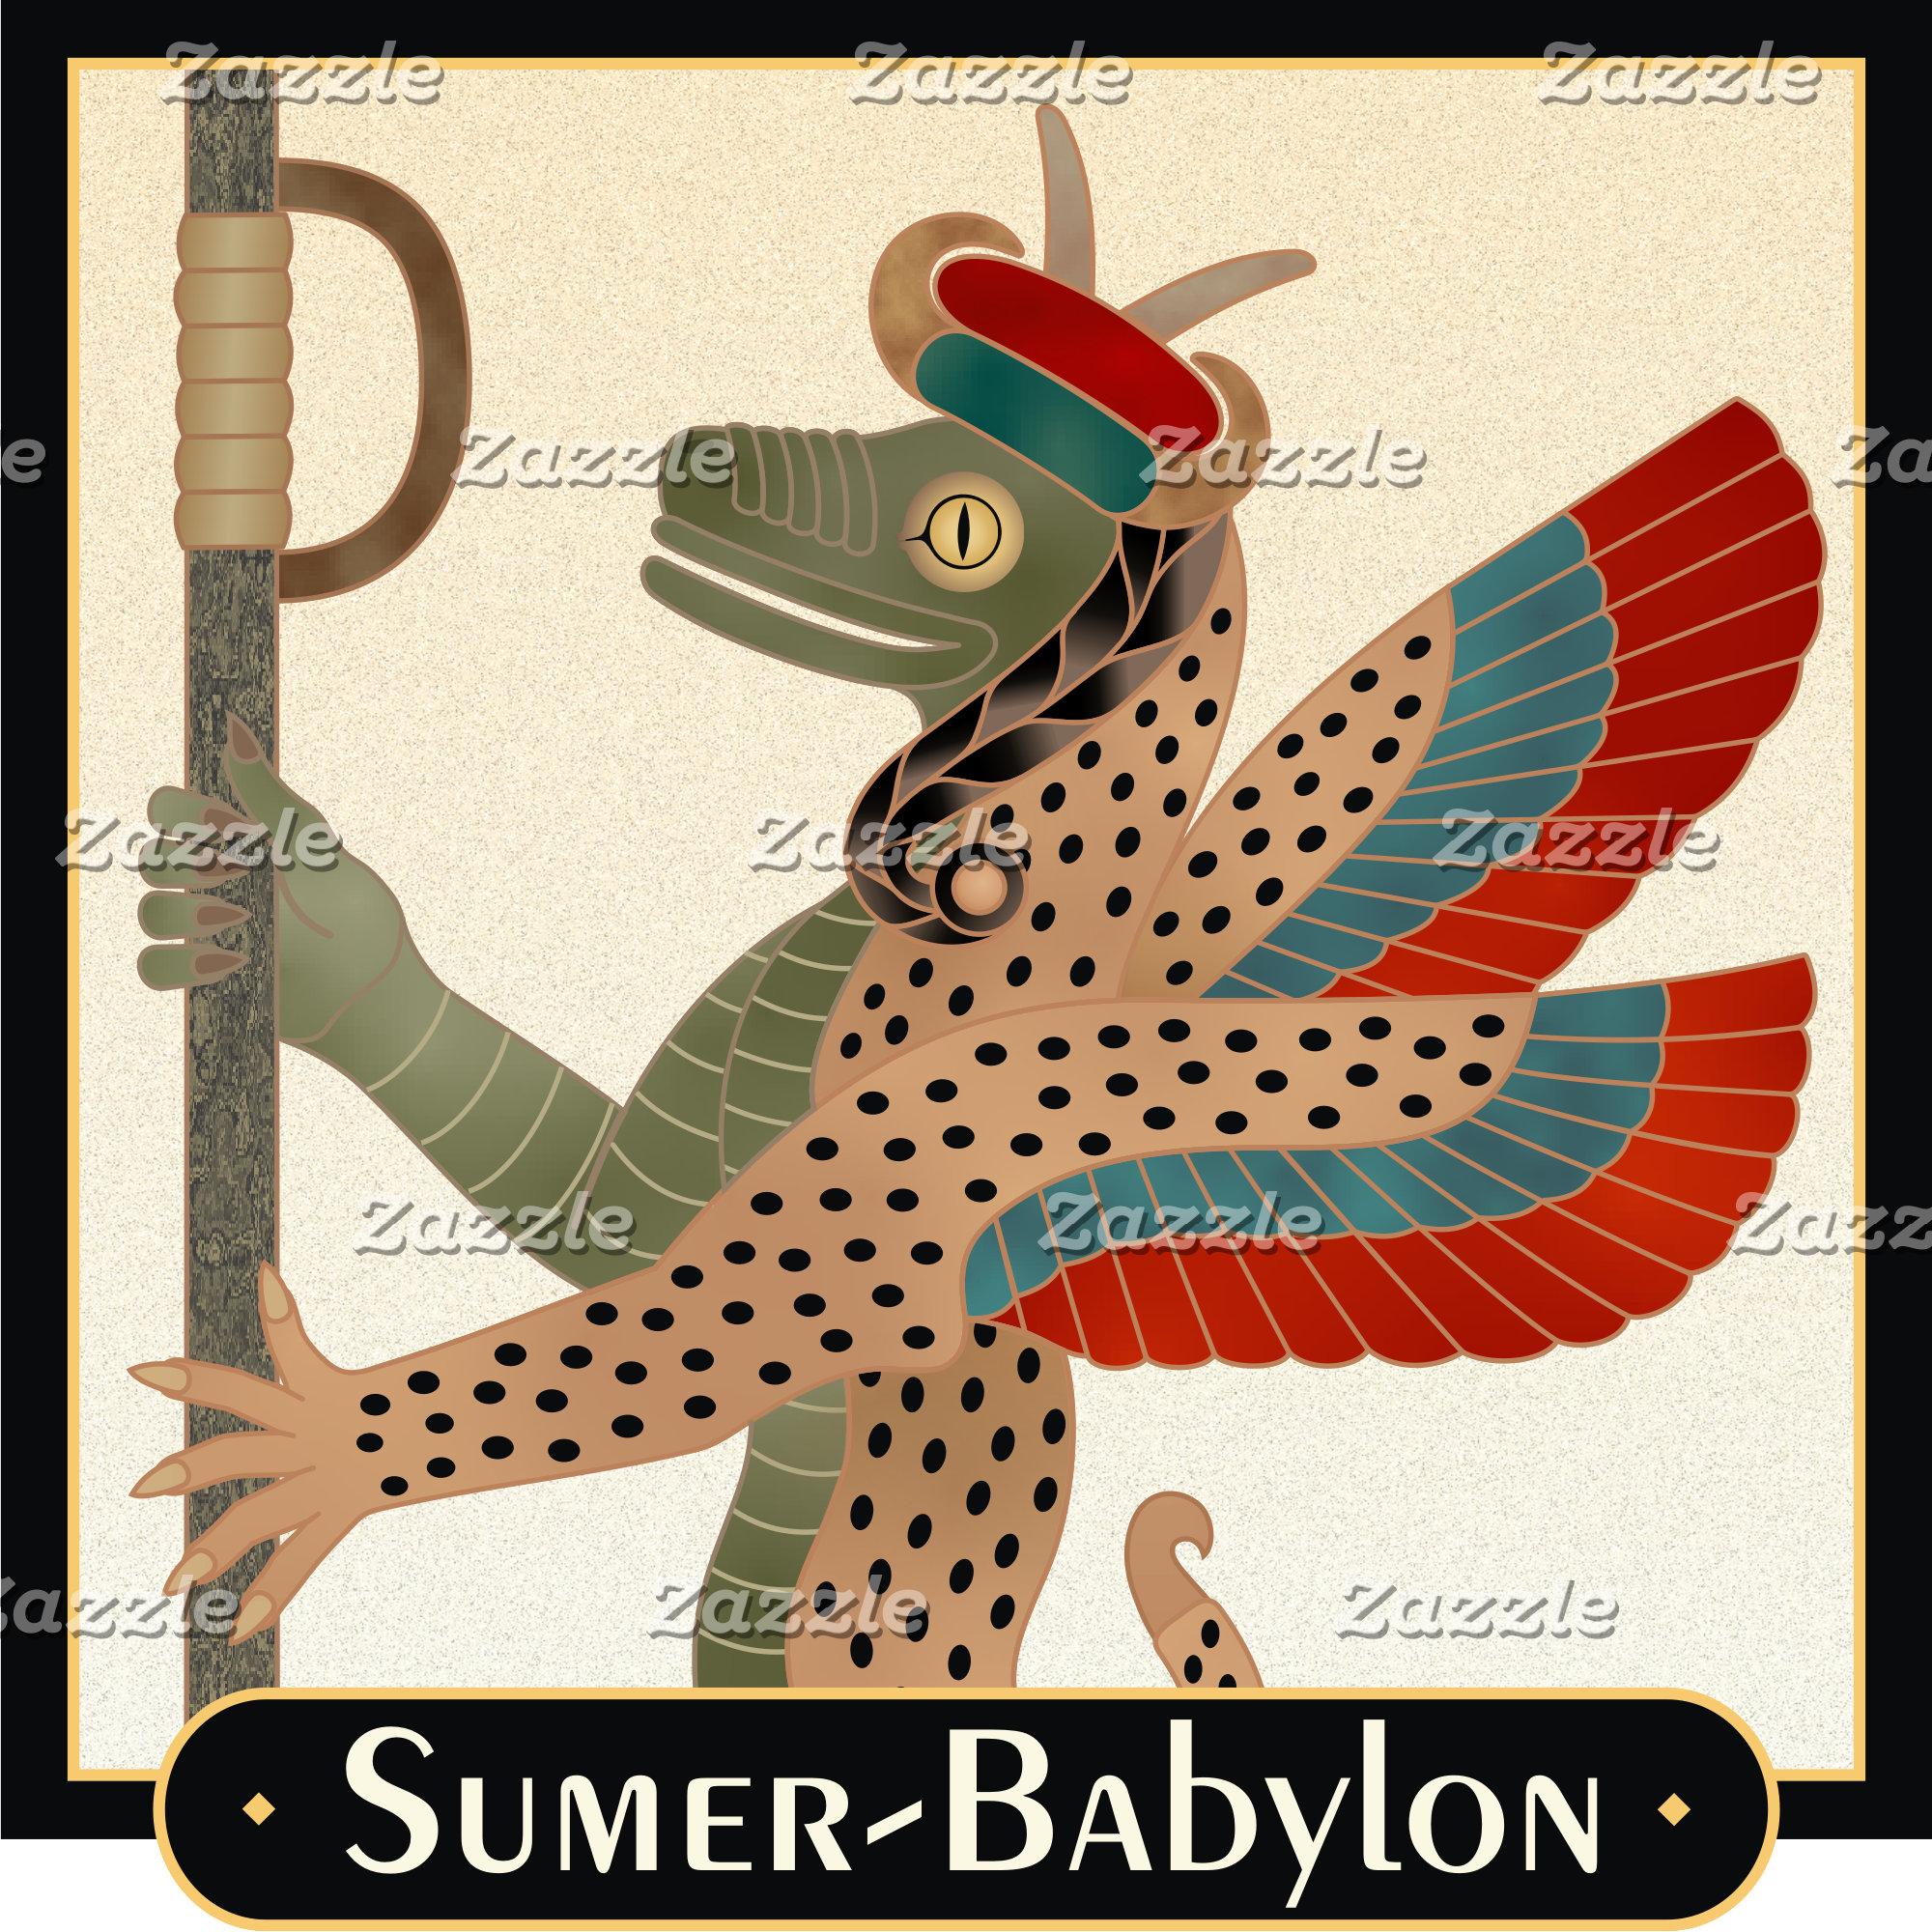 Sumer - Babylon